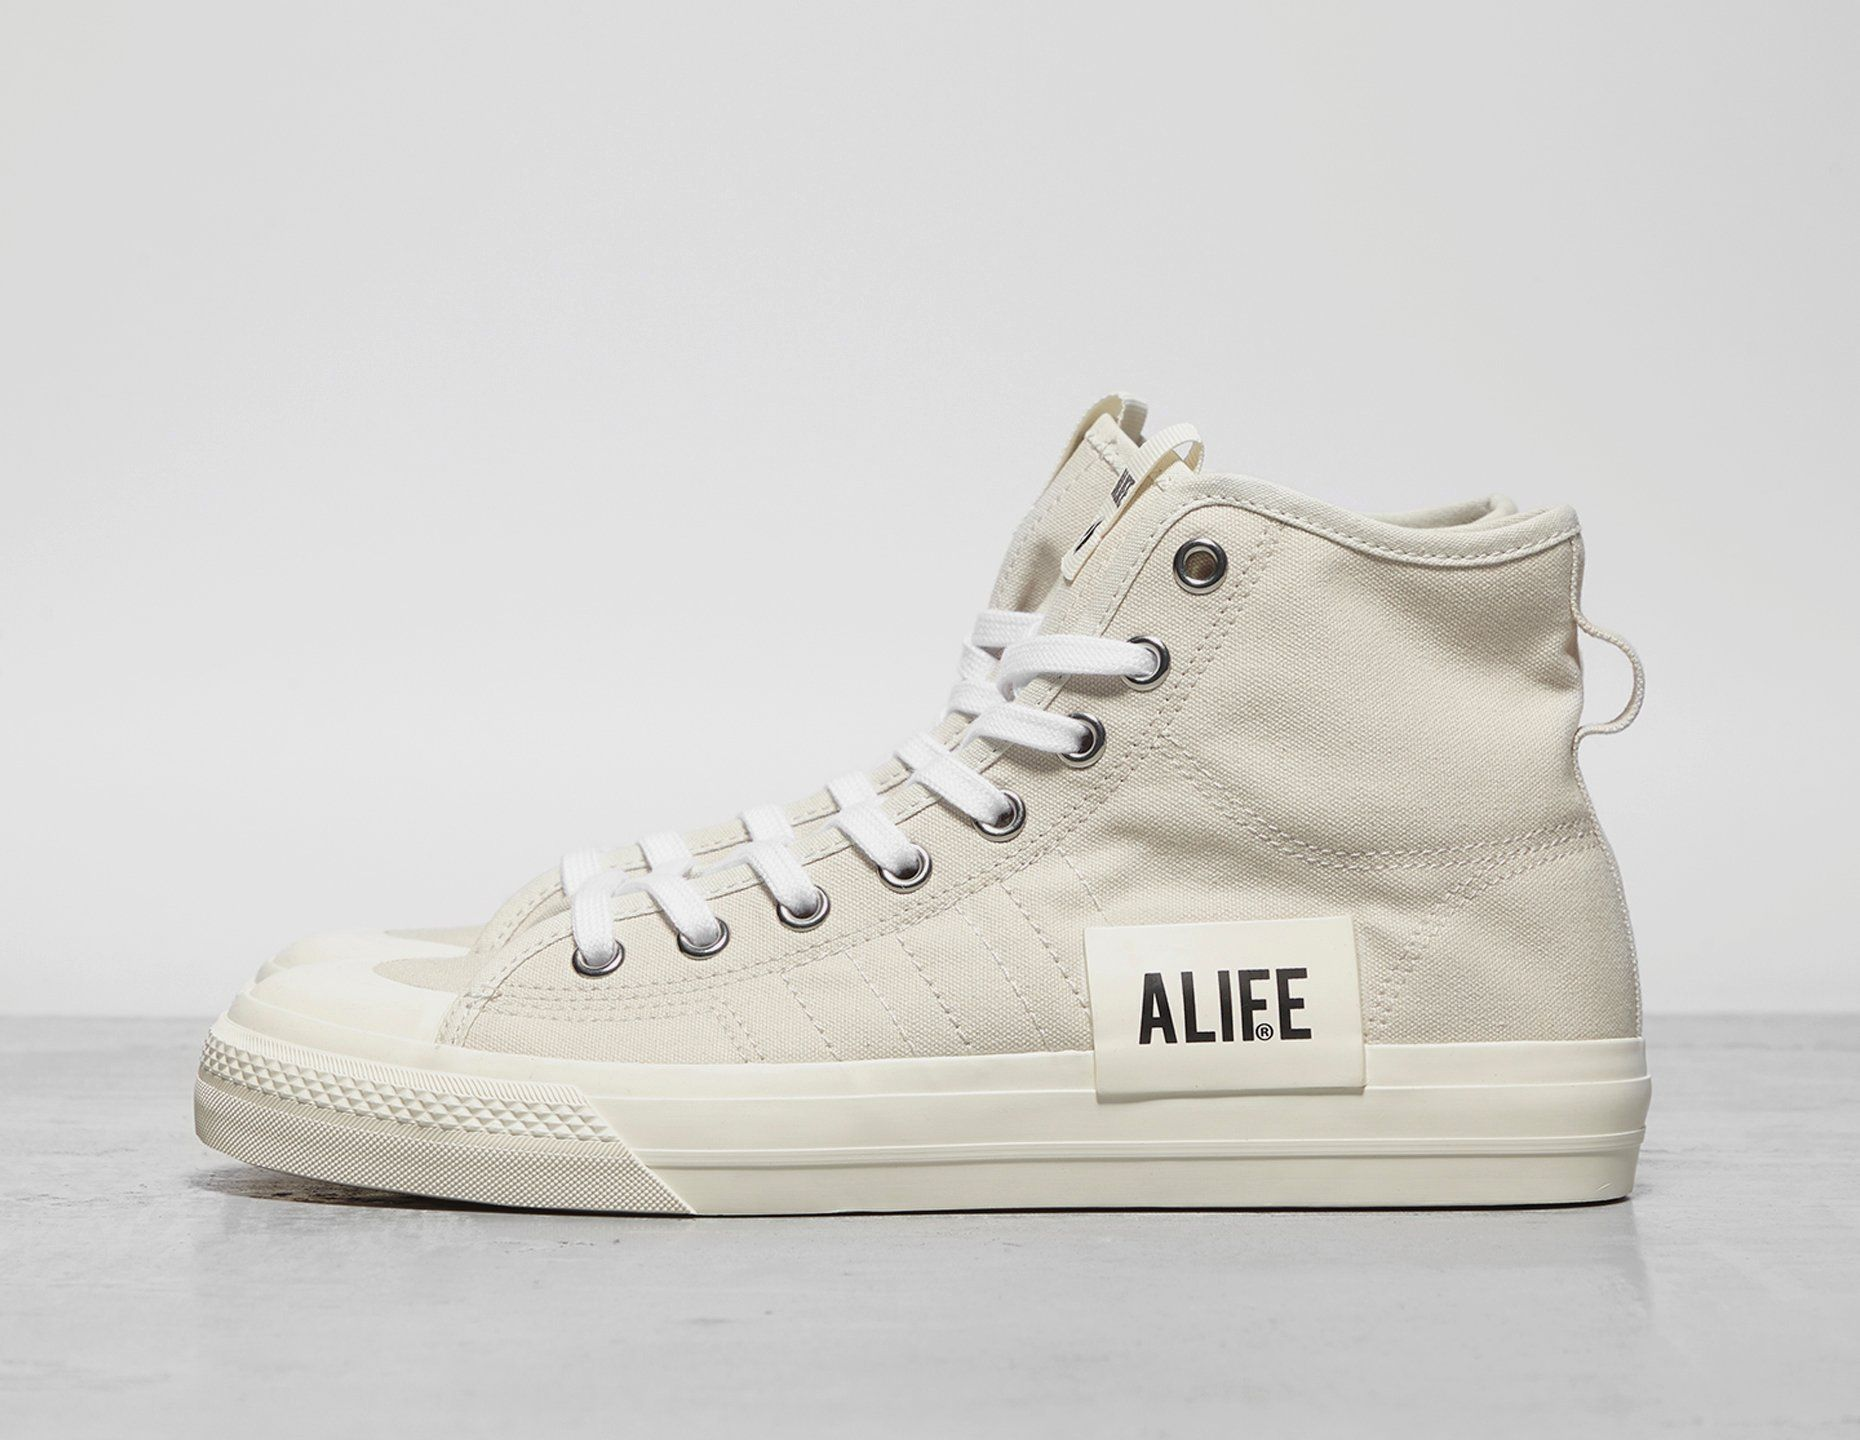 80be123c adidas Consortium x Alife Nizza Hi | Footpatrol